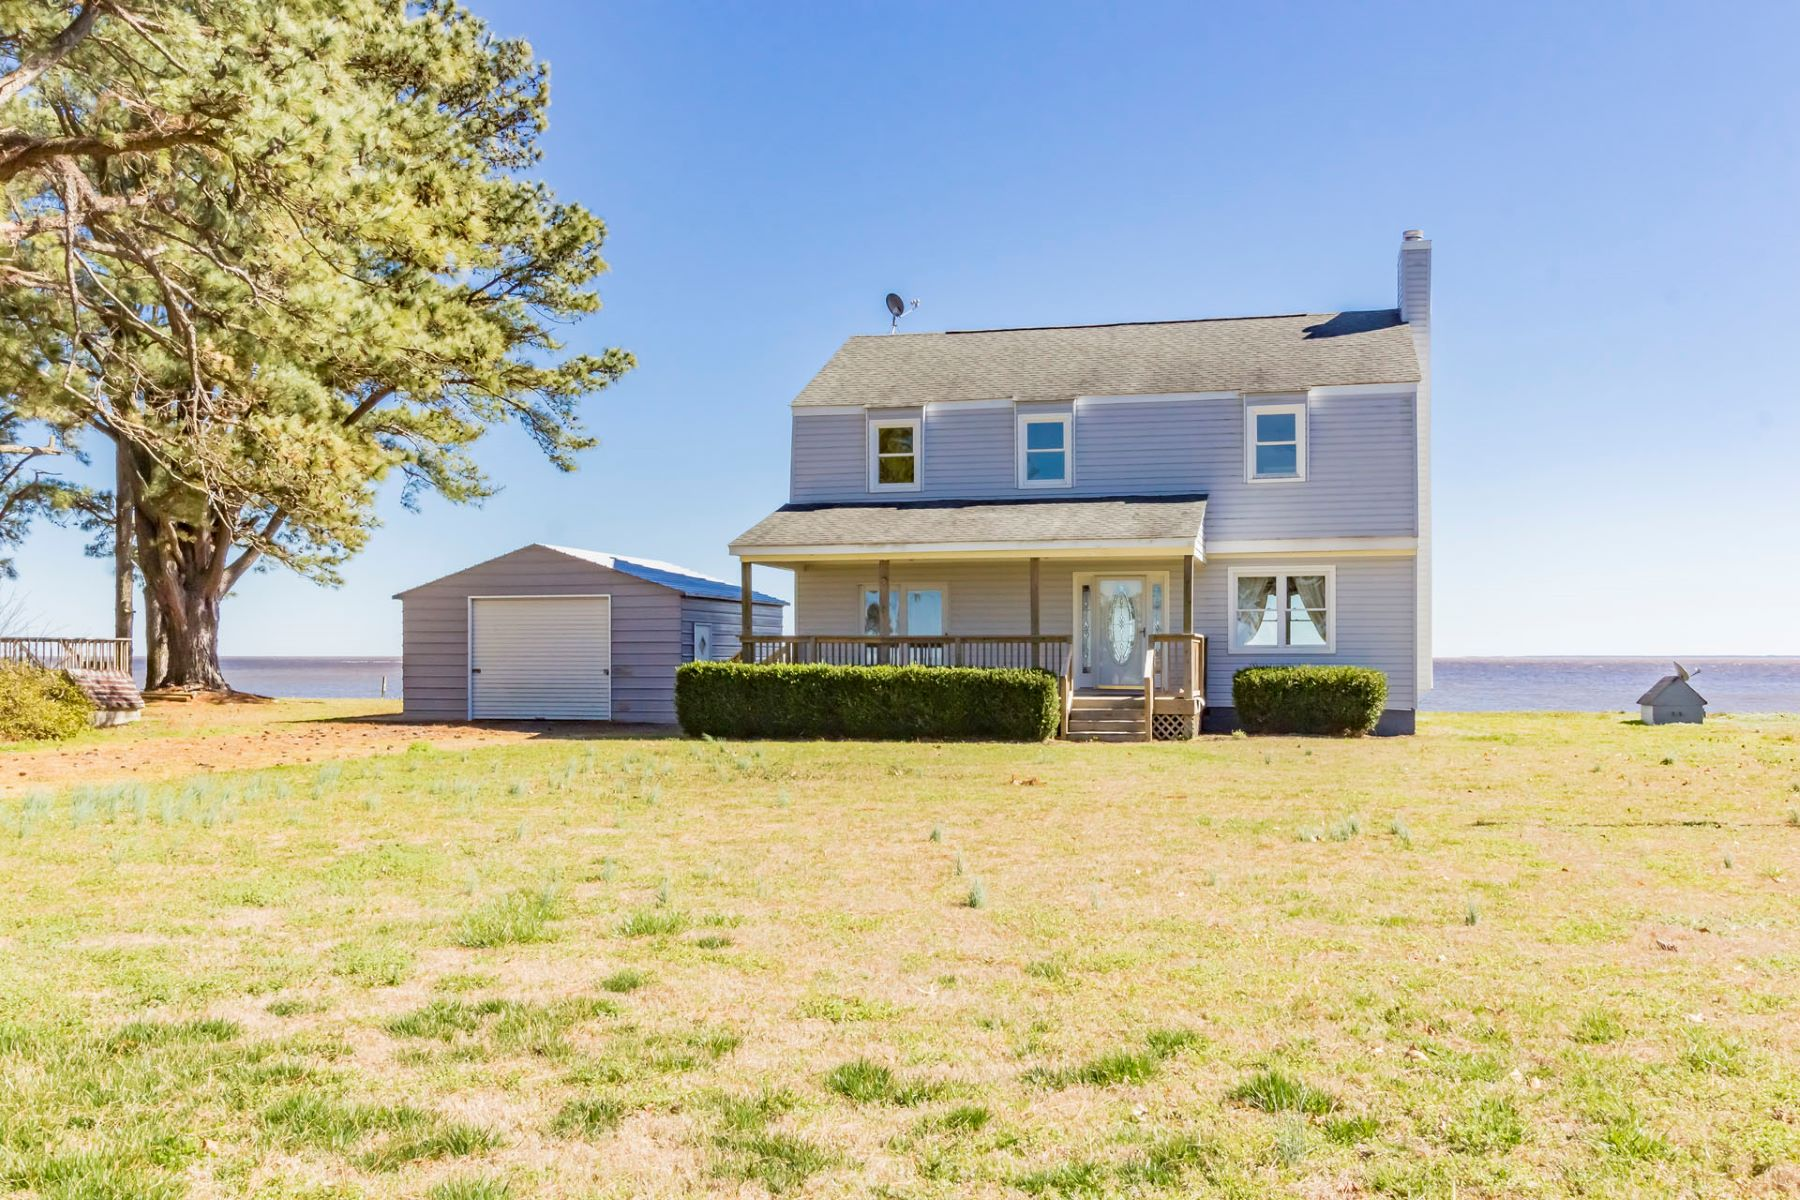 Single Family Home for Active at 108 Soundside Drive Hertford, North Carolina 27944 United States